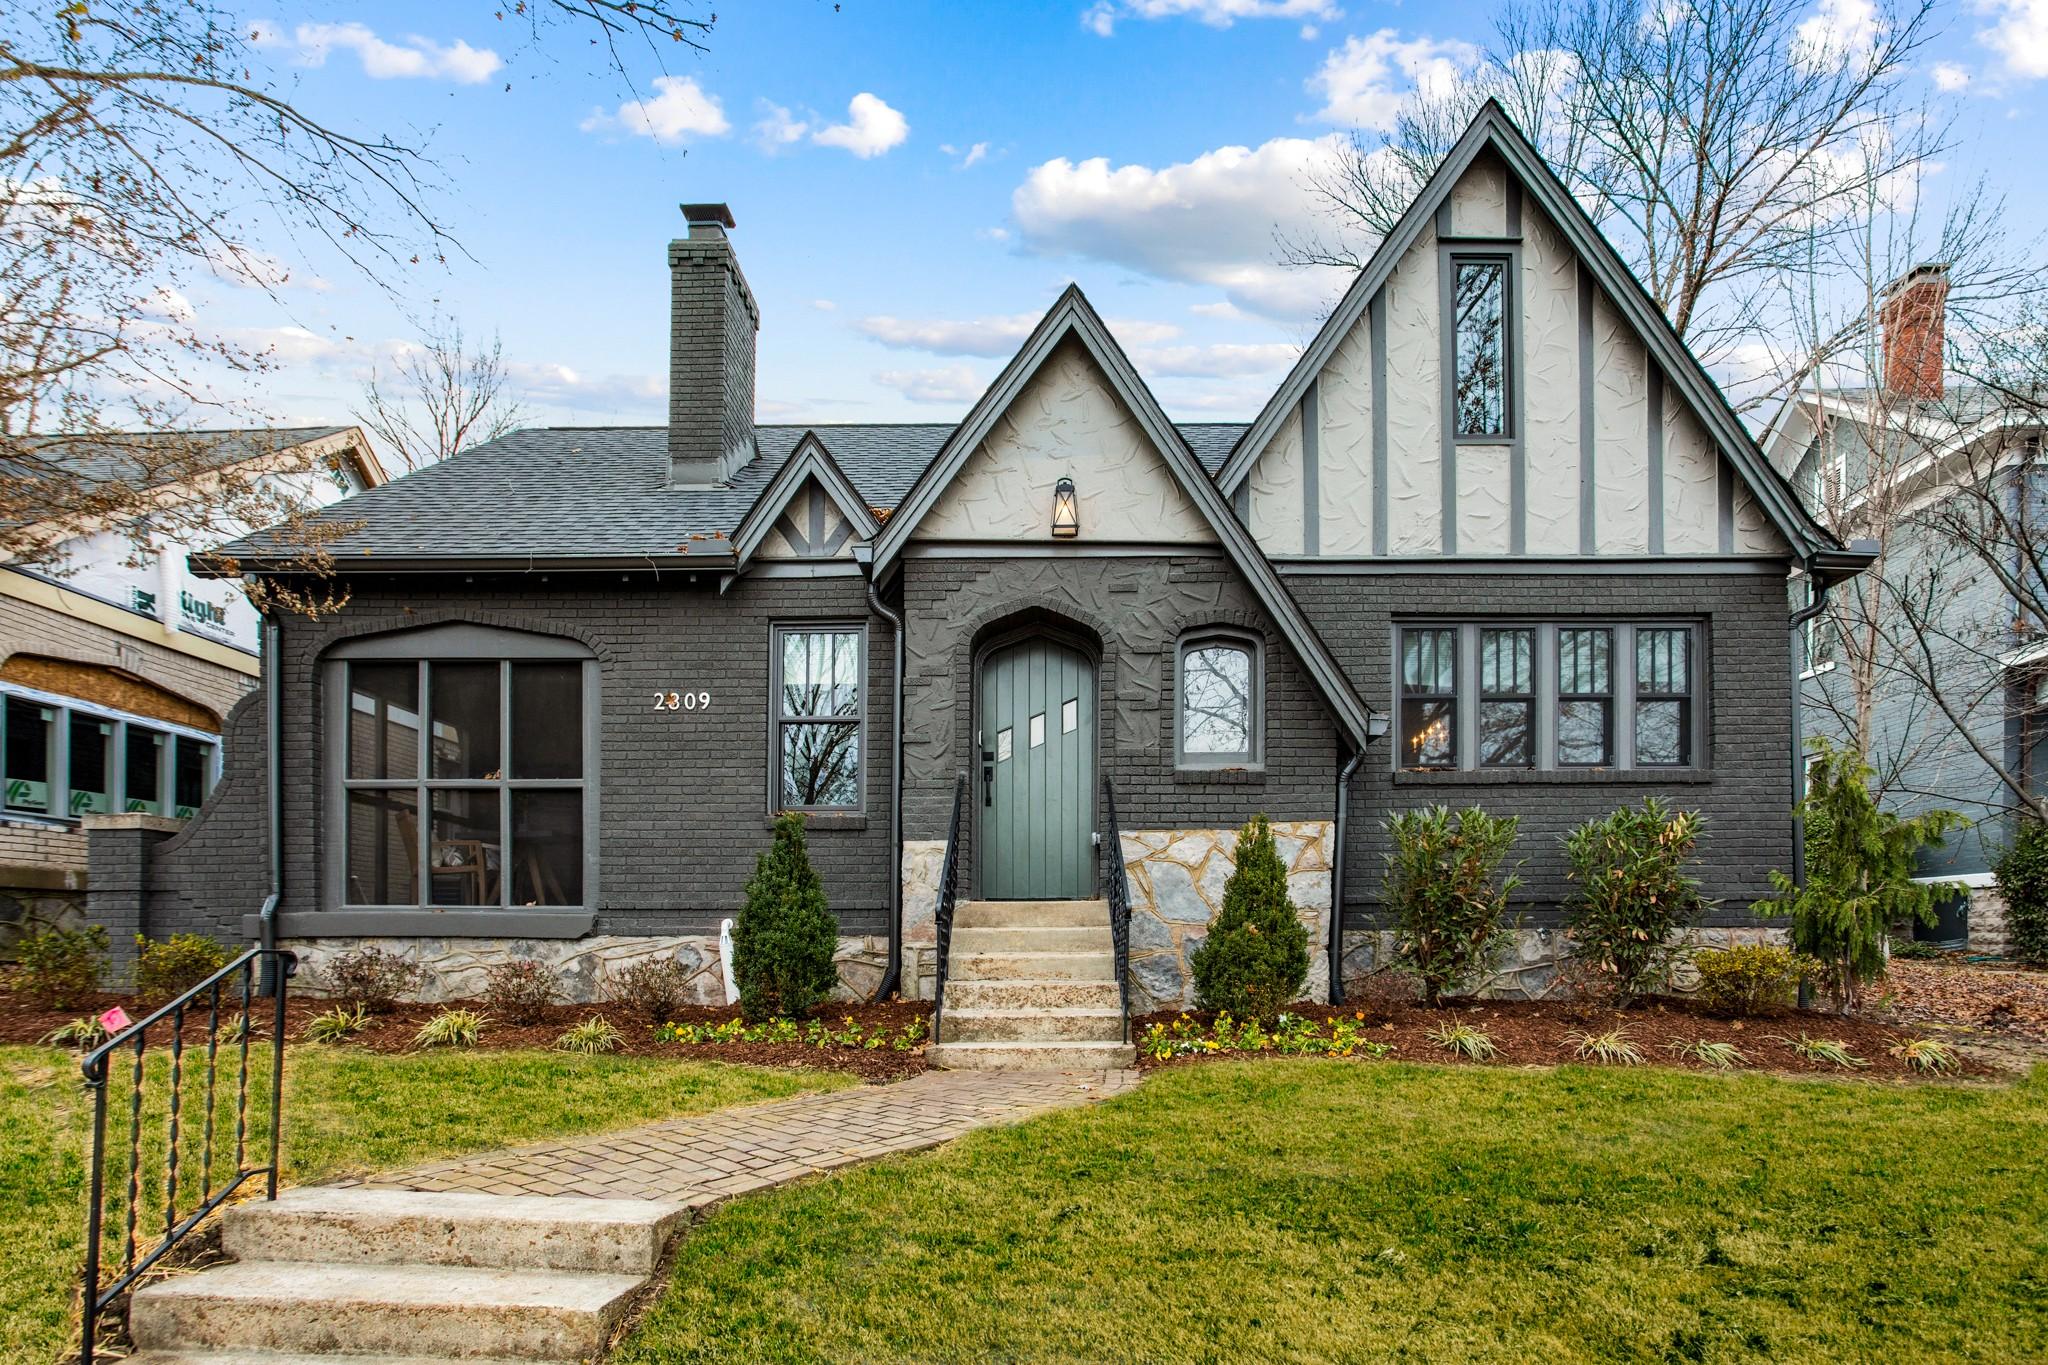 2809 Oakland Ave, Nashville, TN 37212 - Nashville, TN real estate listing